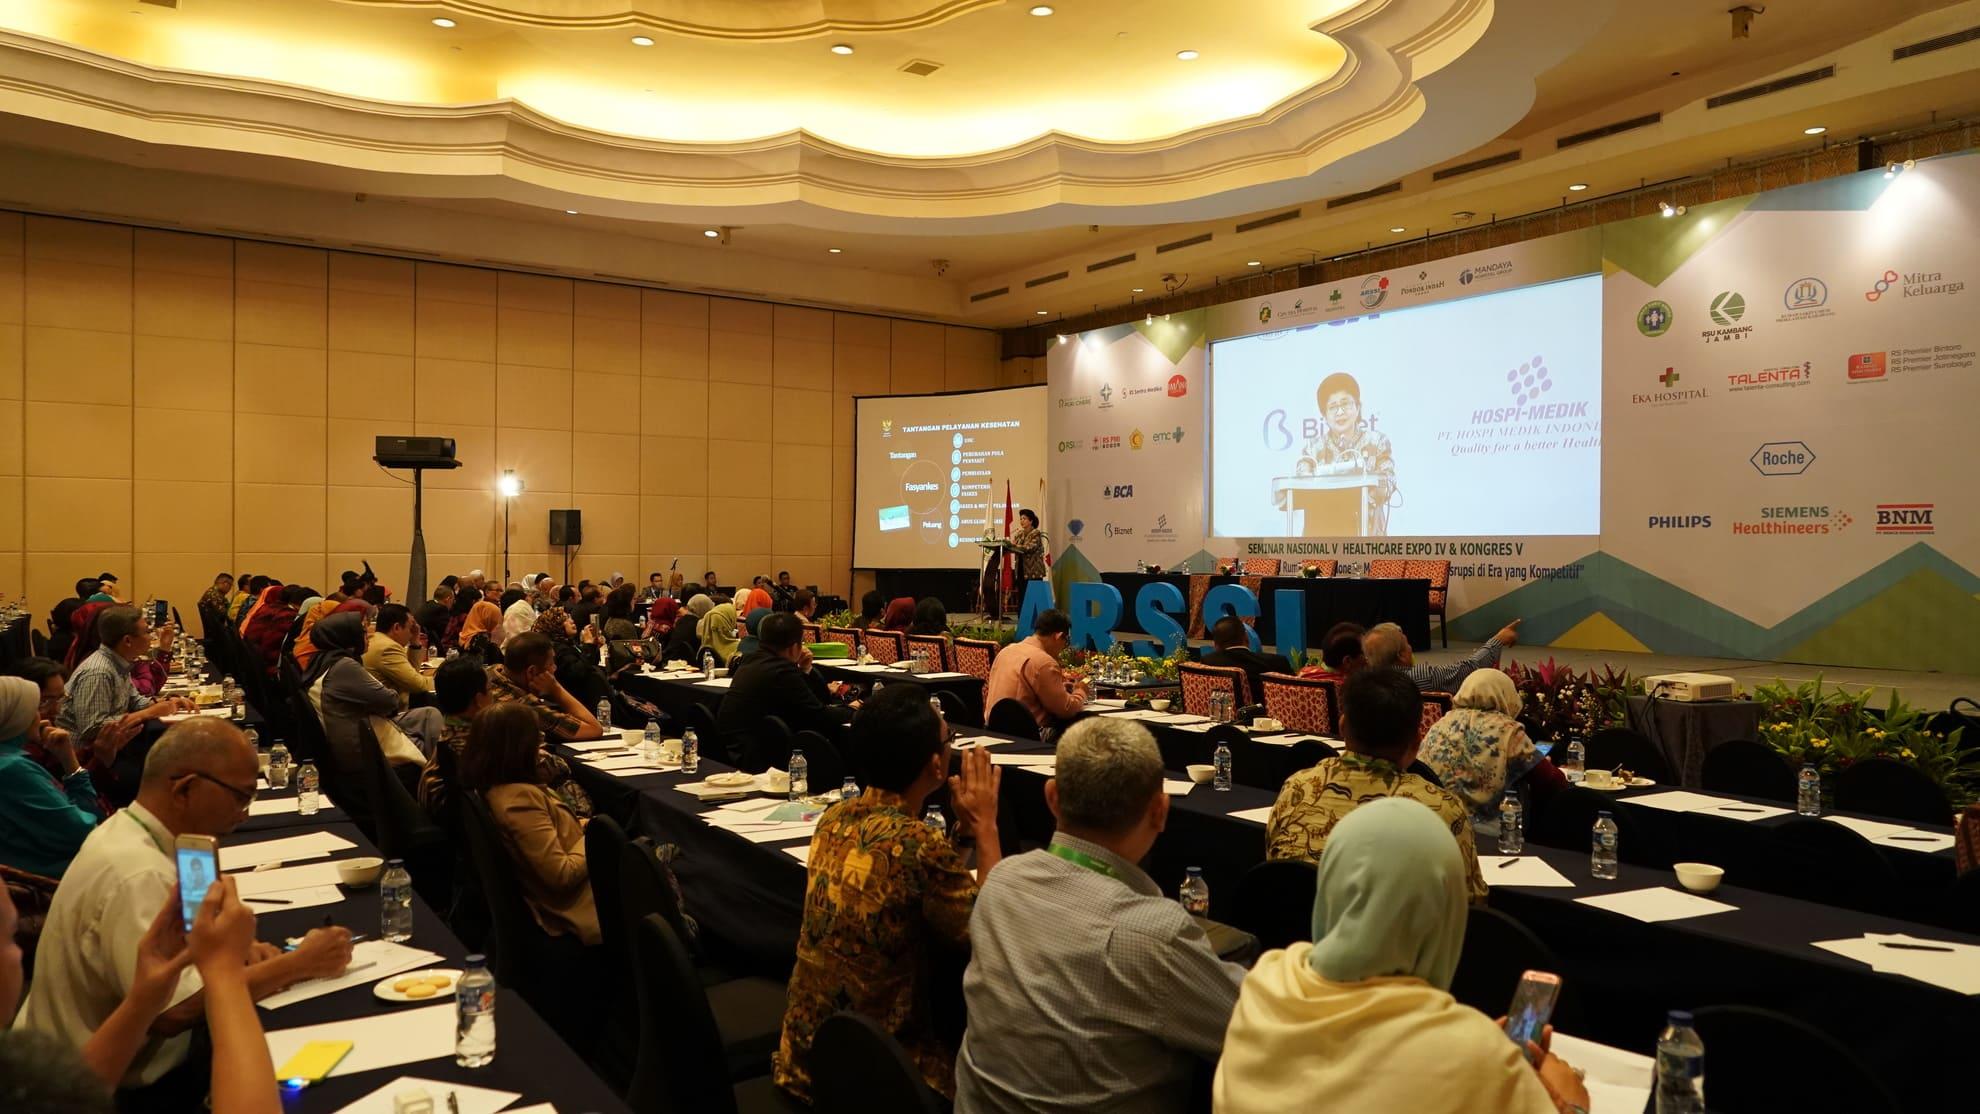 18-7-2018-keynote-speech-seminar-nasional-v-health-ecpo-iv-arssi-4